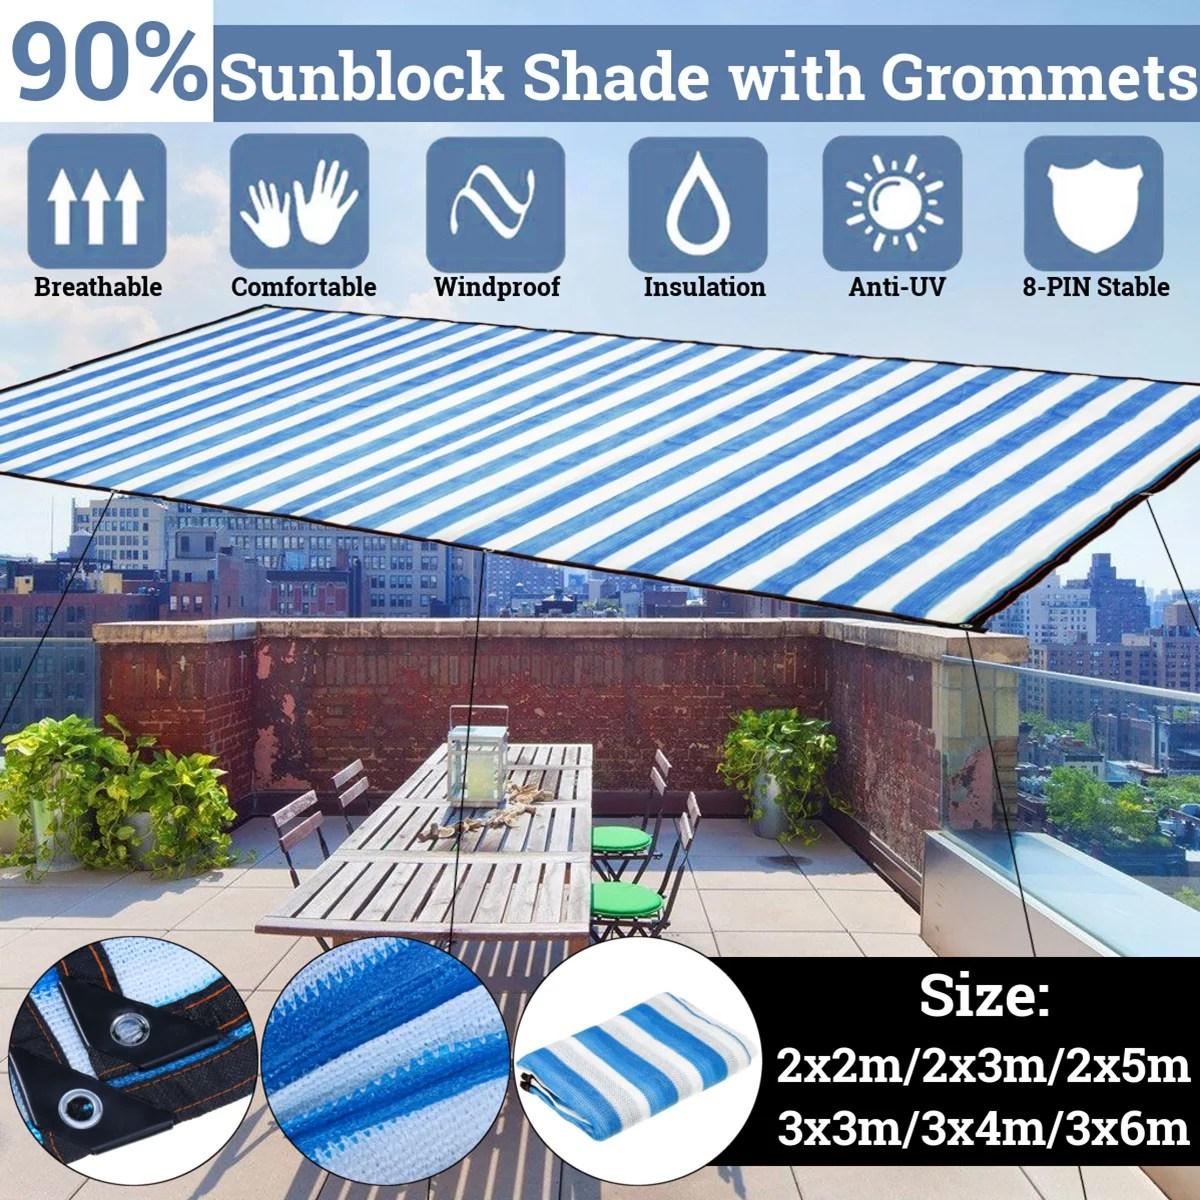 90 shade fabric cloth garden decor outdoor patio sun shade cloth with grommets garden sun shade sails canopy shelter cover sunshades for yard